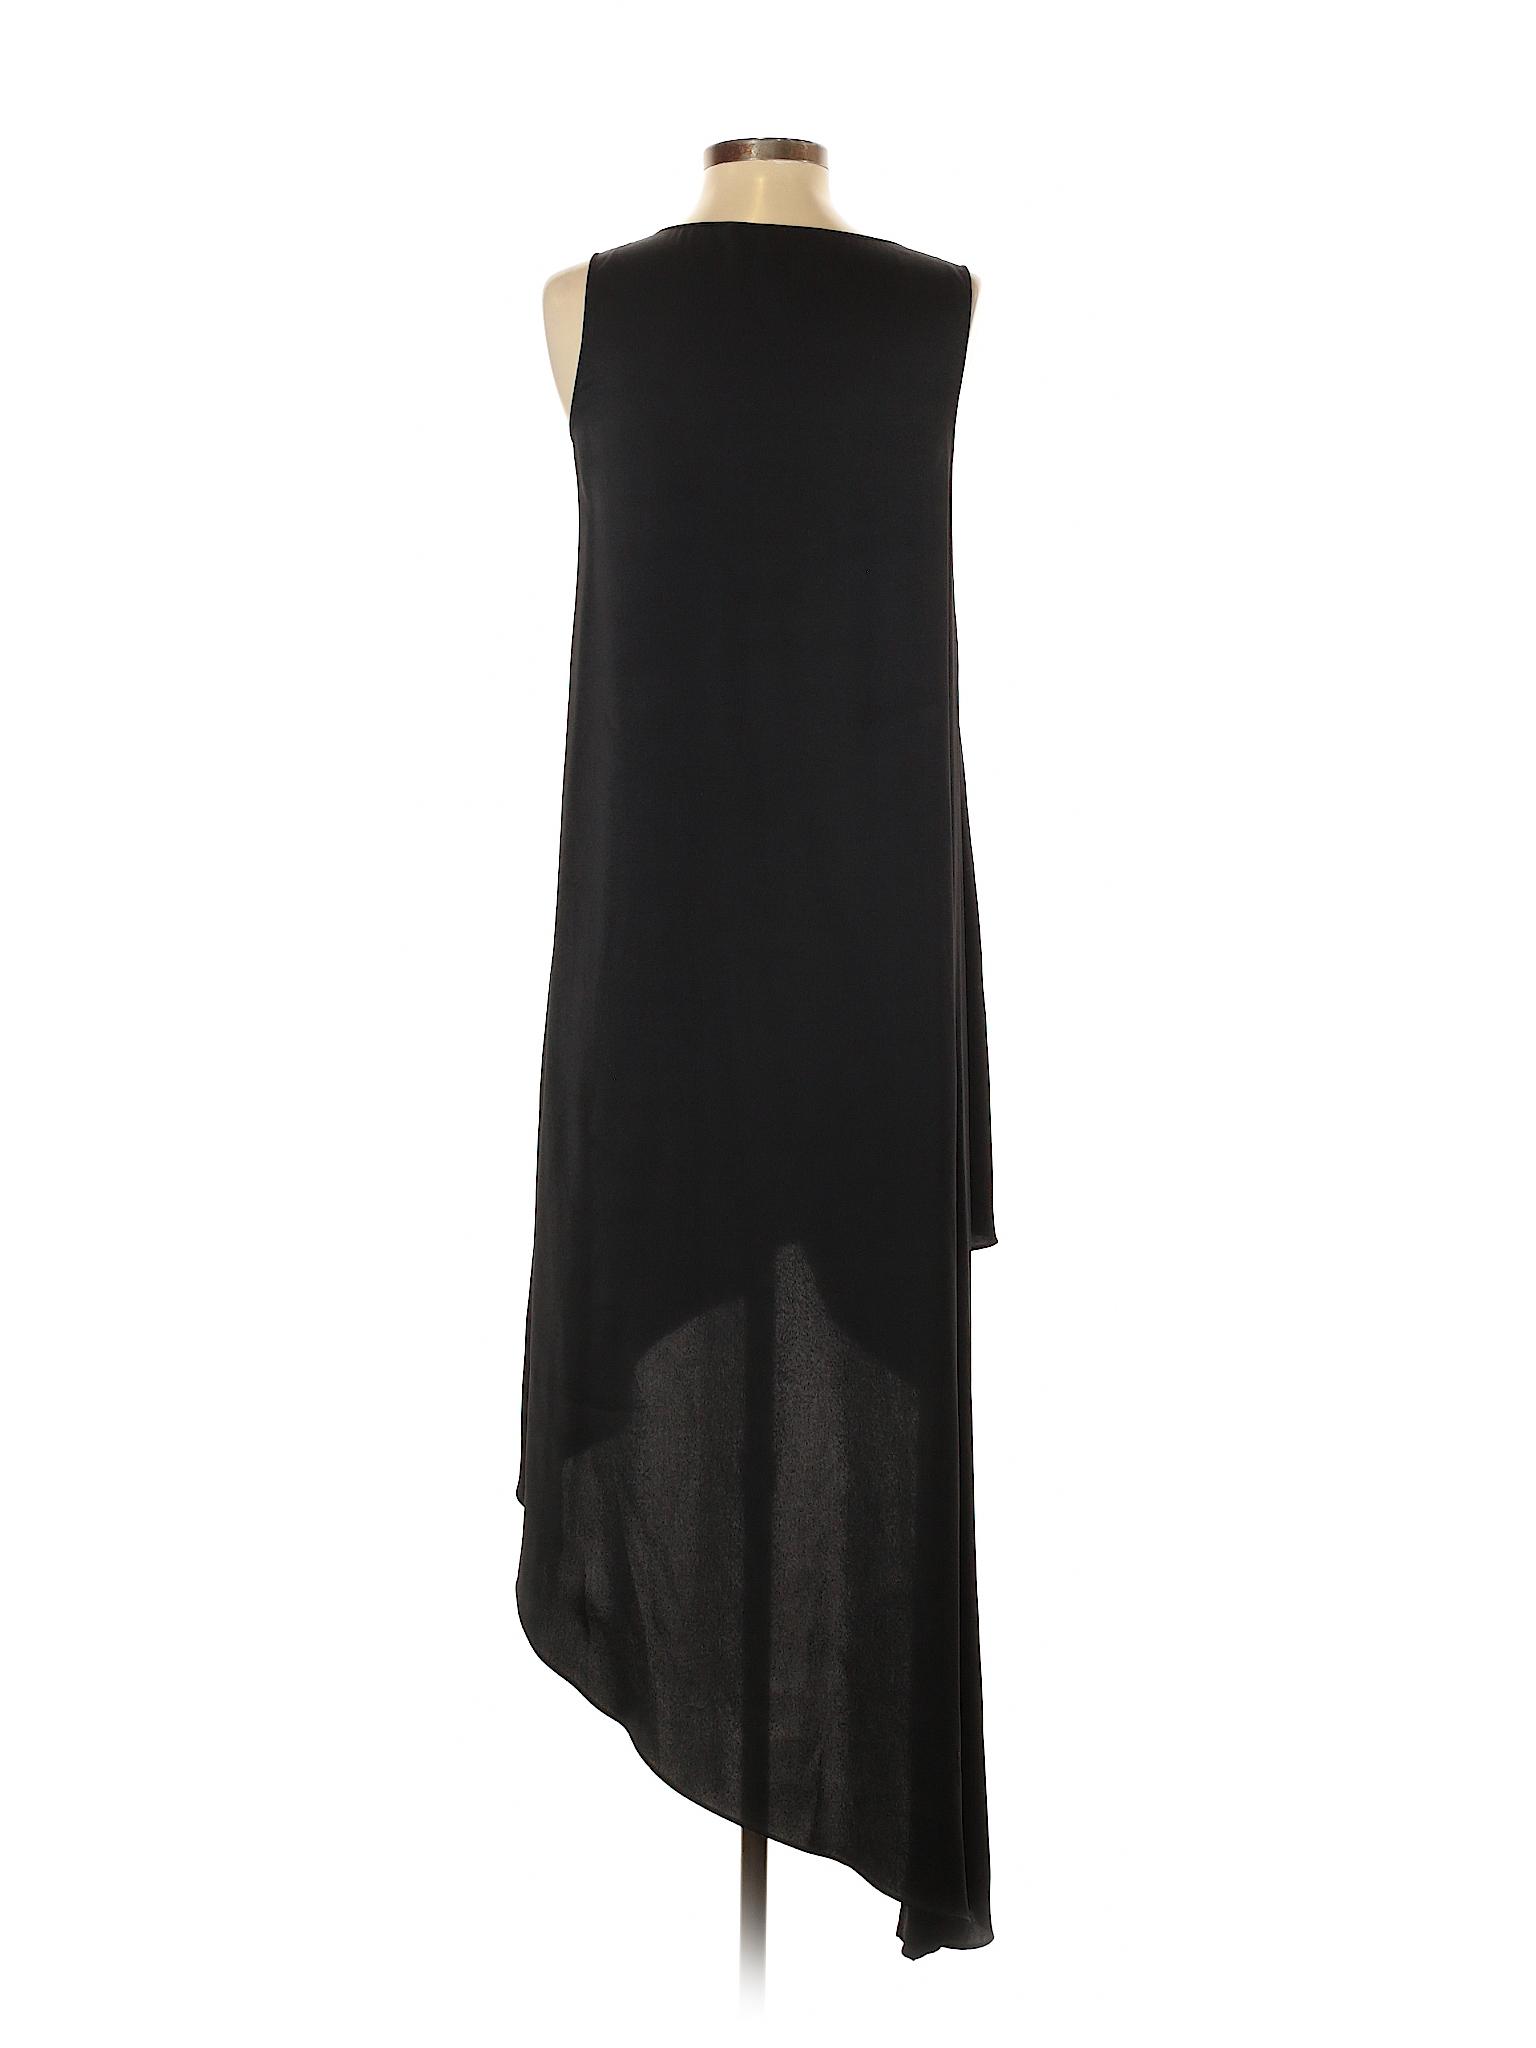 Boutique Boutique BCBGMAXAZRIA winter Dress winter BCBGMAXAZRIA Casual K8HF1qP8xw